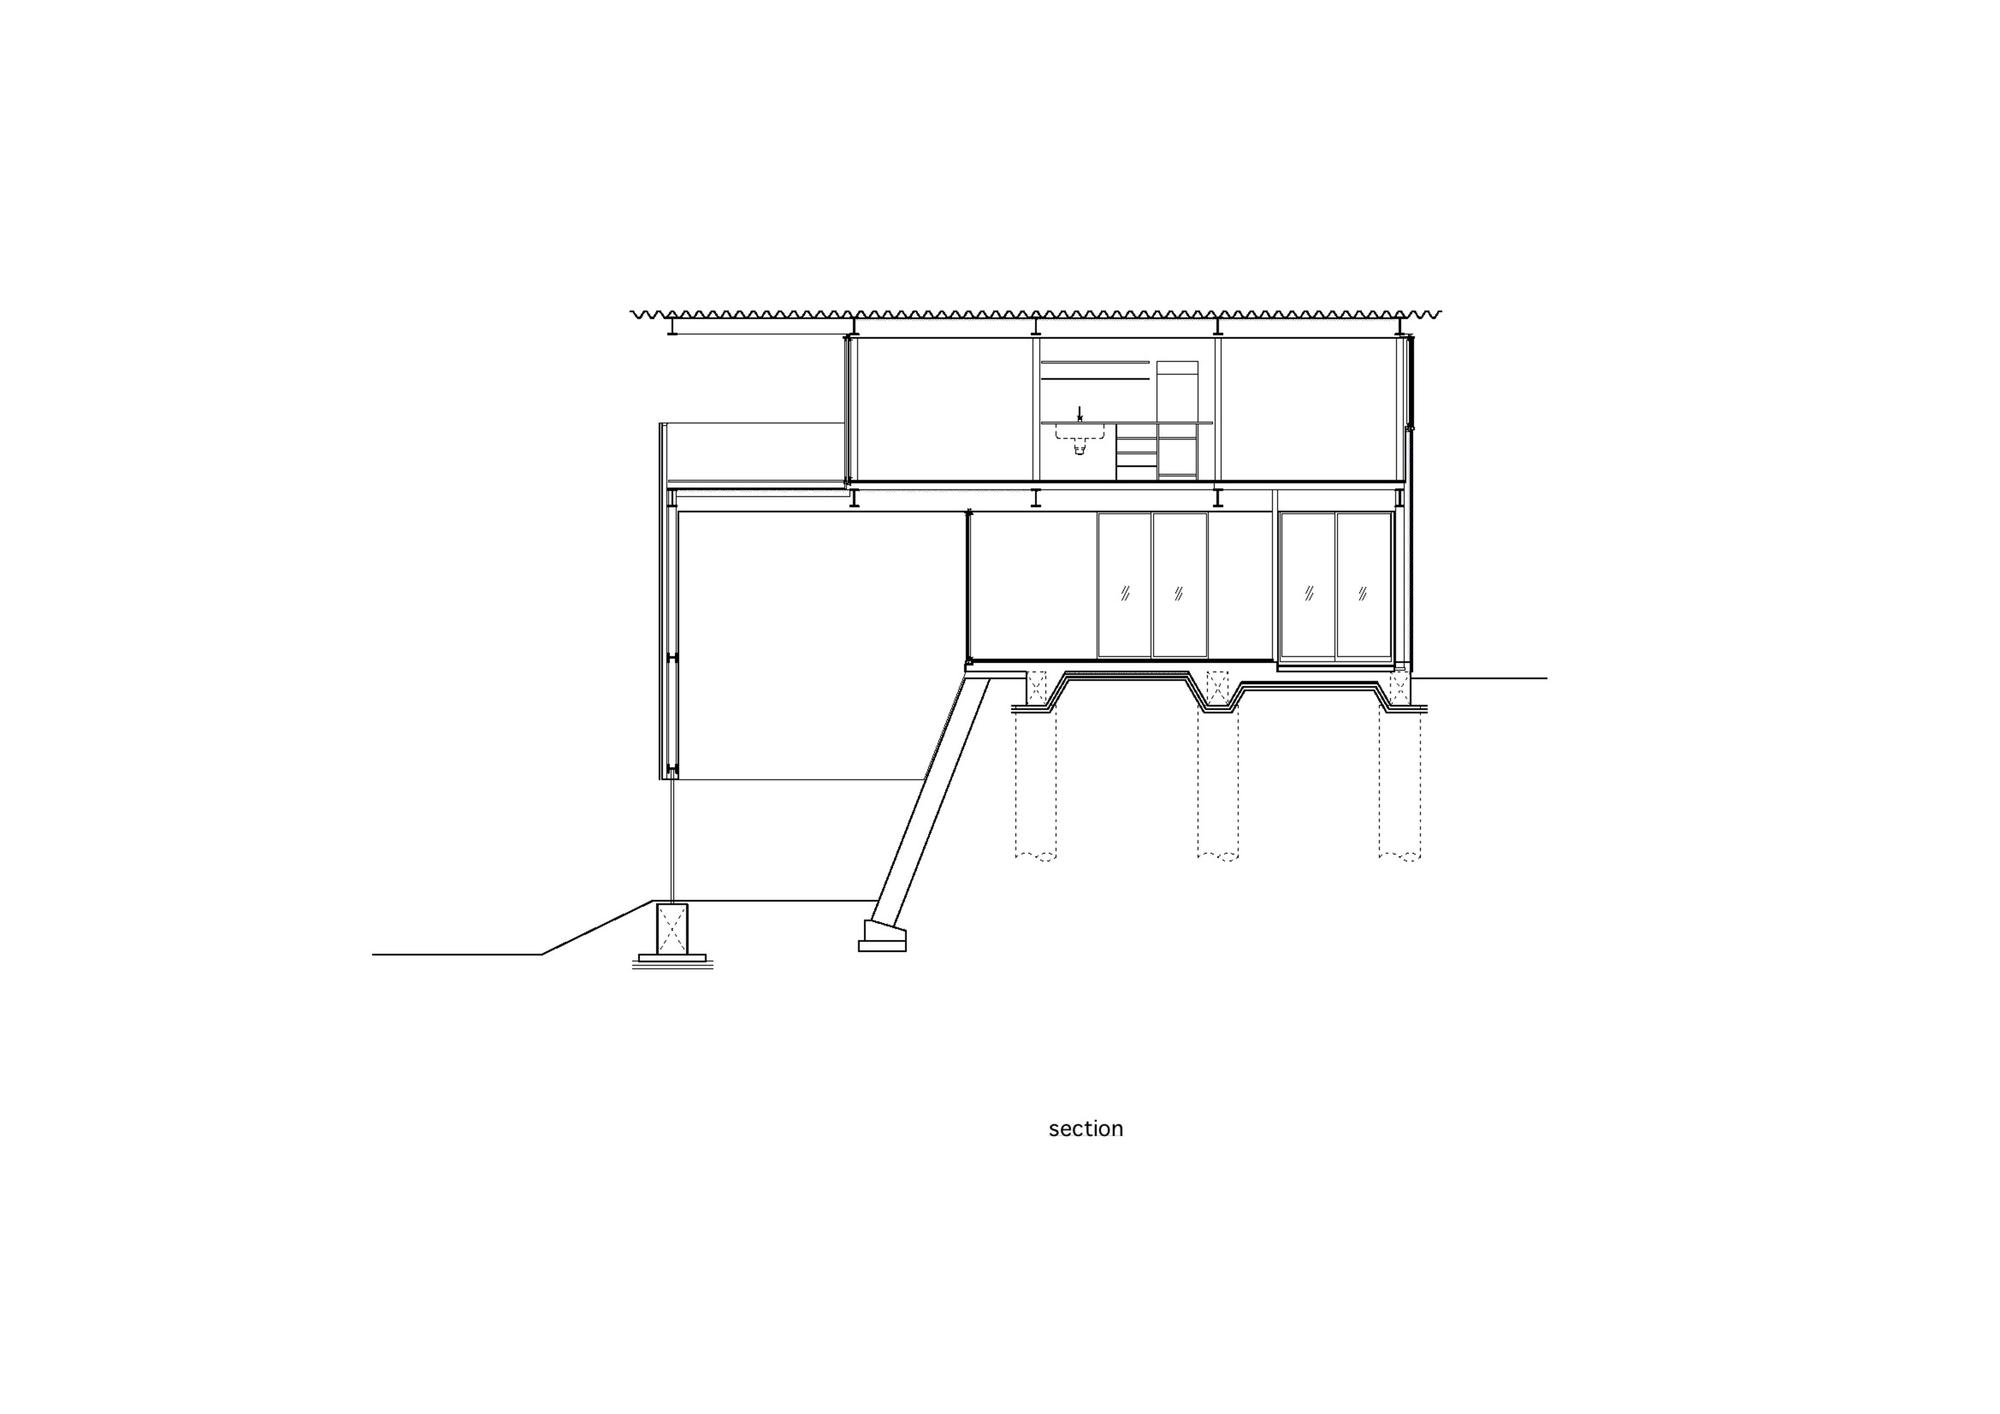 540ea147c07a802ff5000172_house-in-miyake-hidetaka-nakahara-architects-yoshio-ohno-architects_section_2